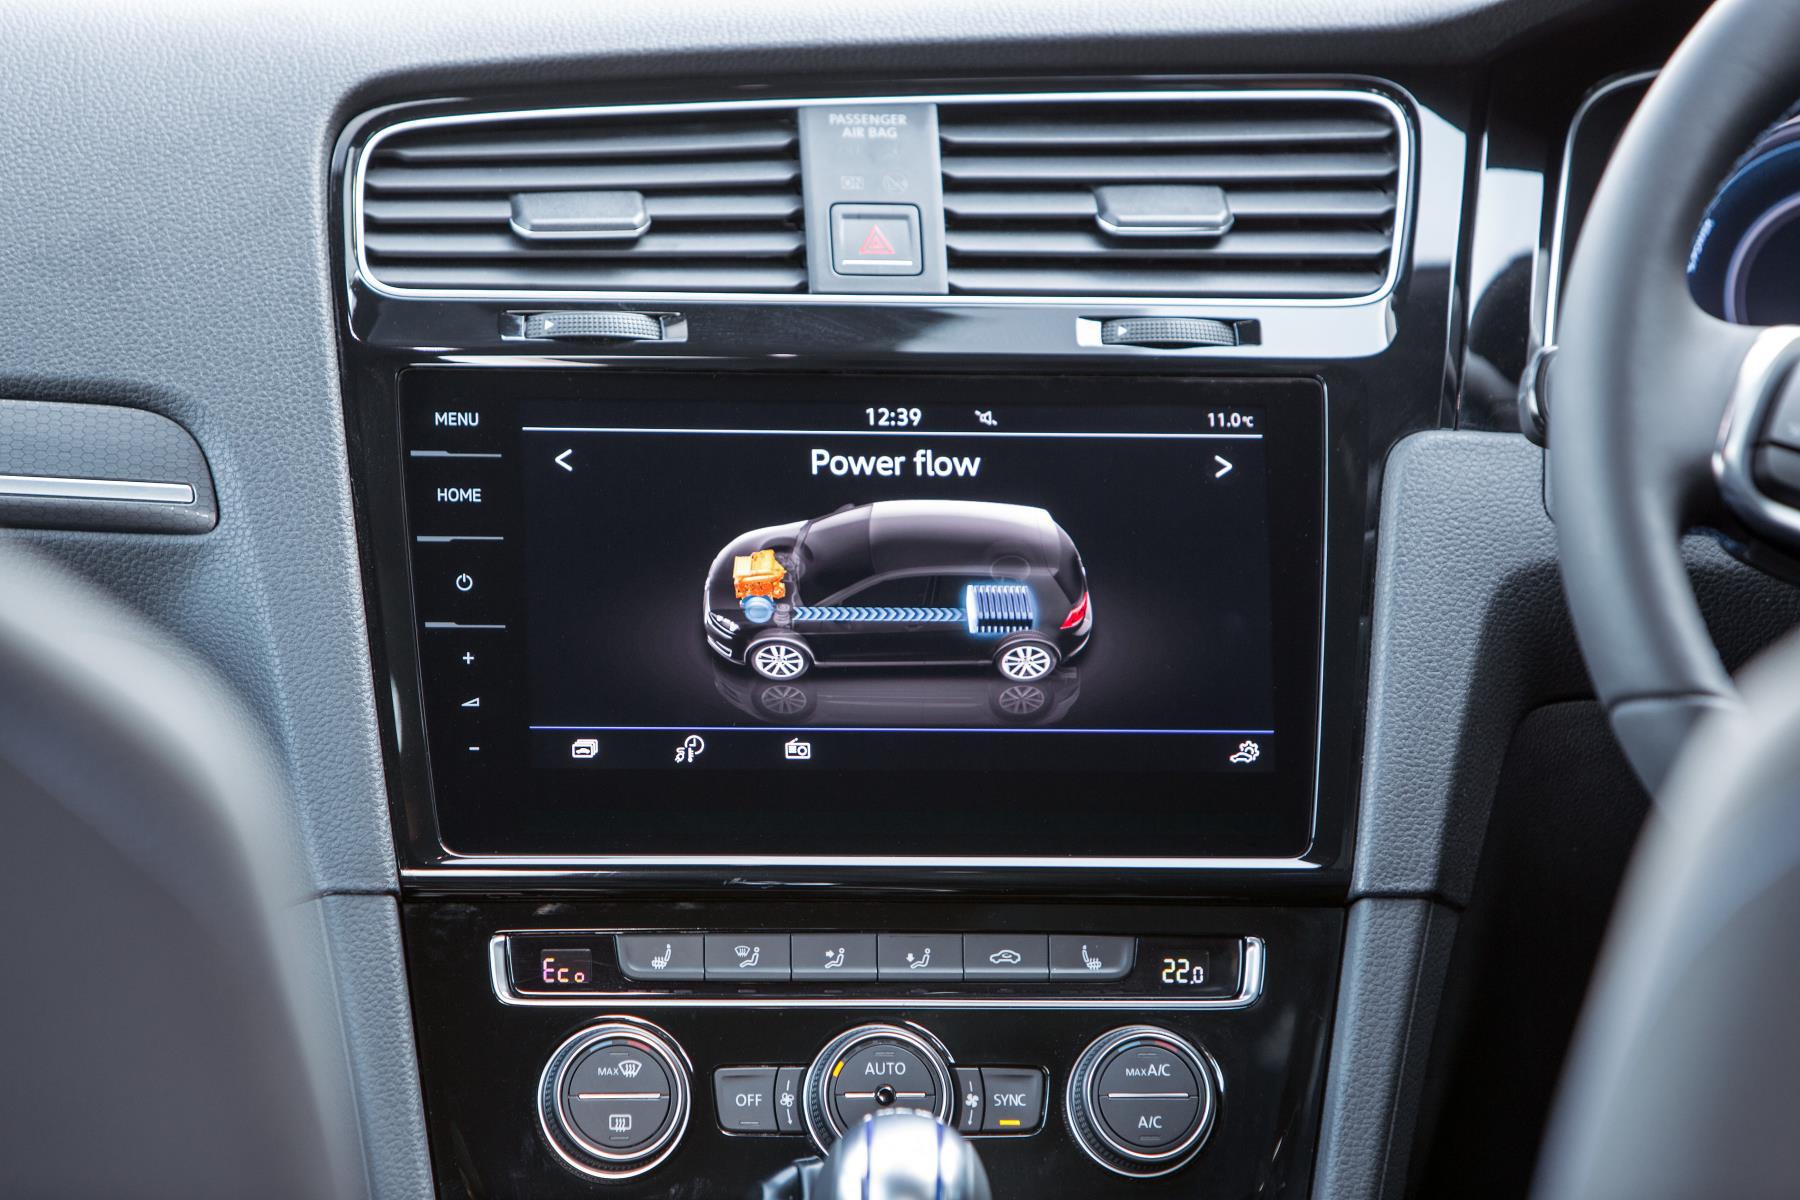 2017 Volkswagen Golf Tsi S >> Volkswagen Golf GTE Advance 1.4 TSI review – plug-in hybrid